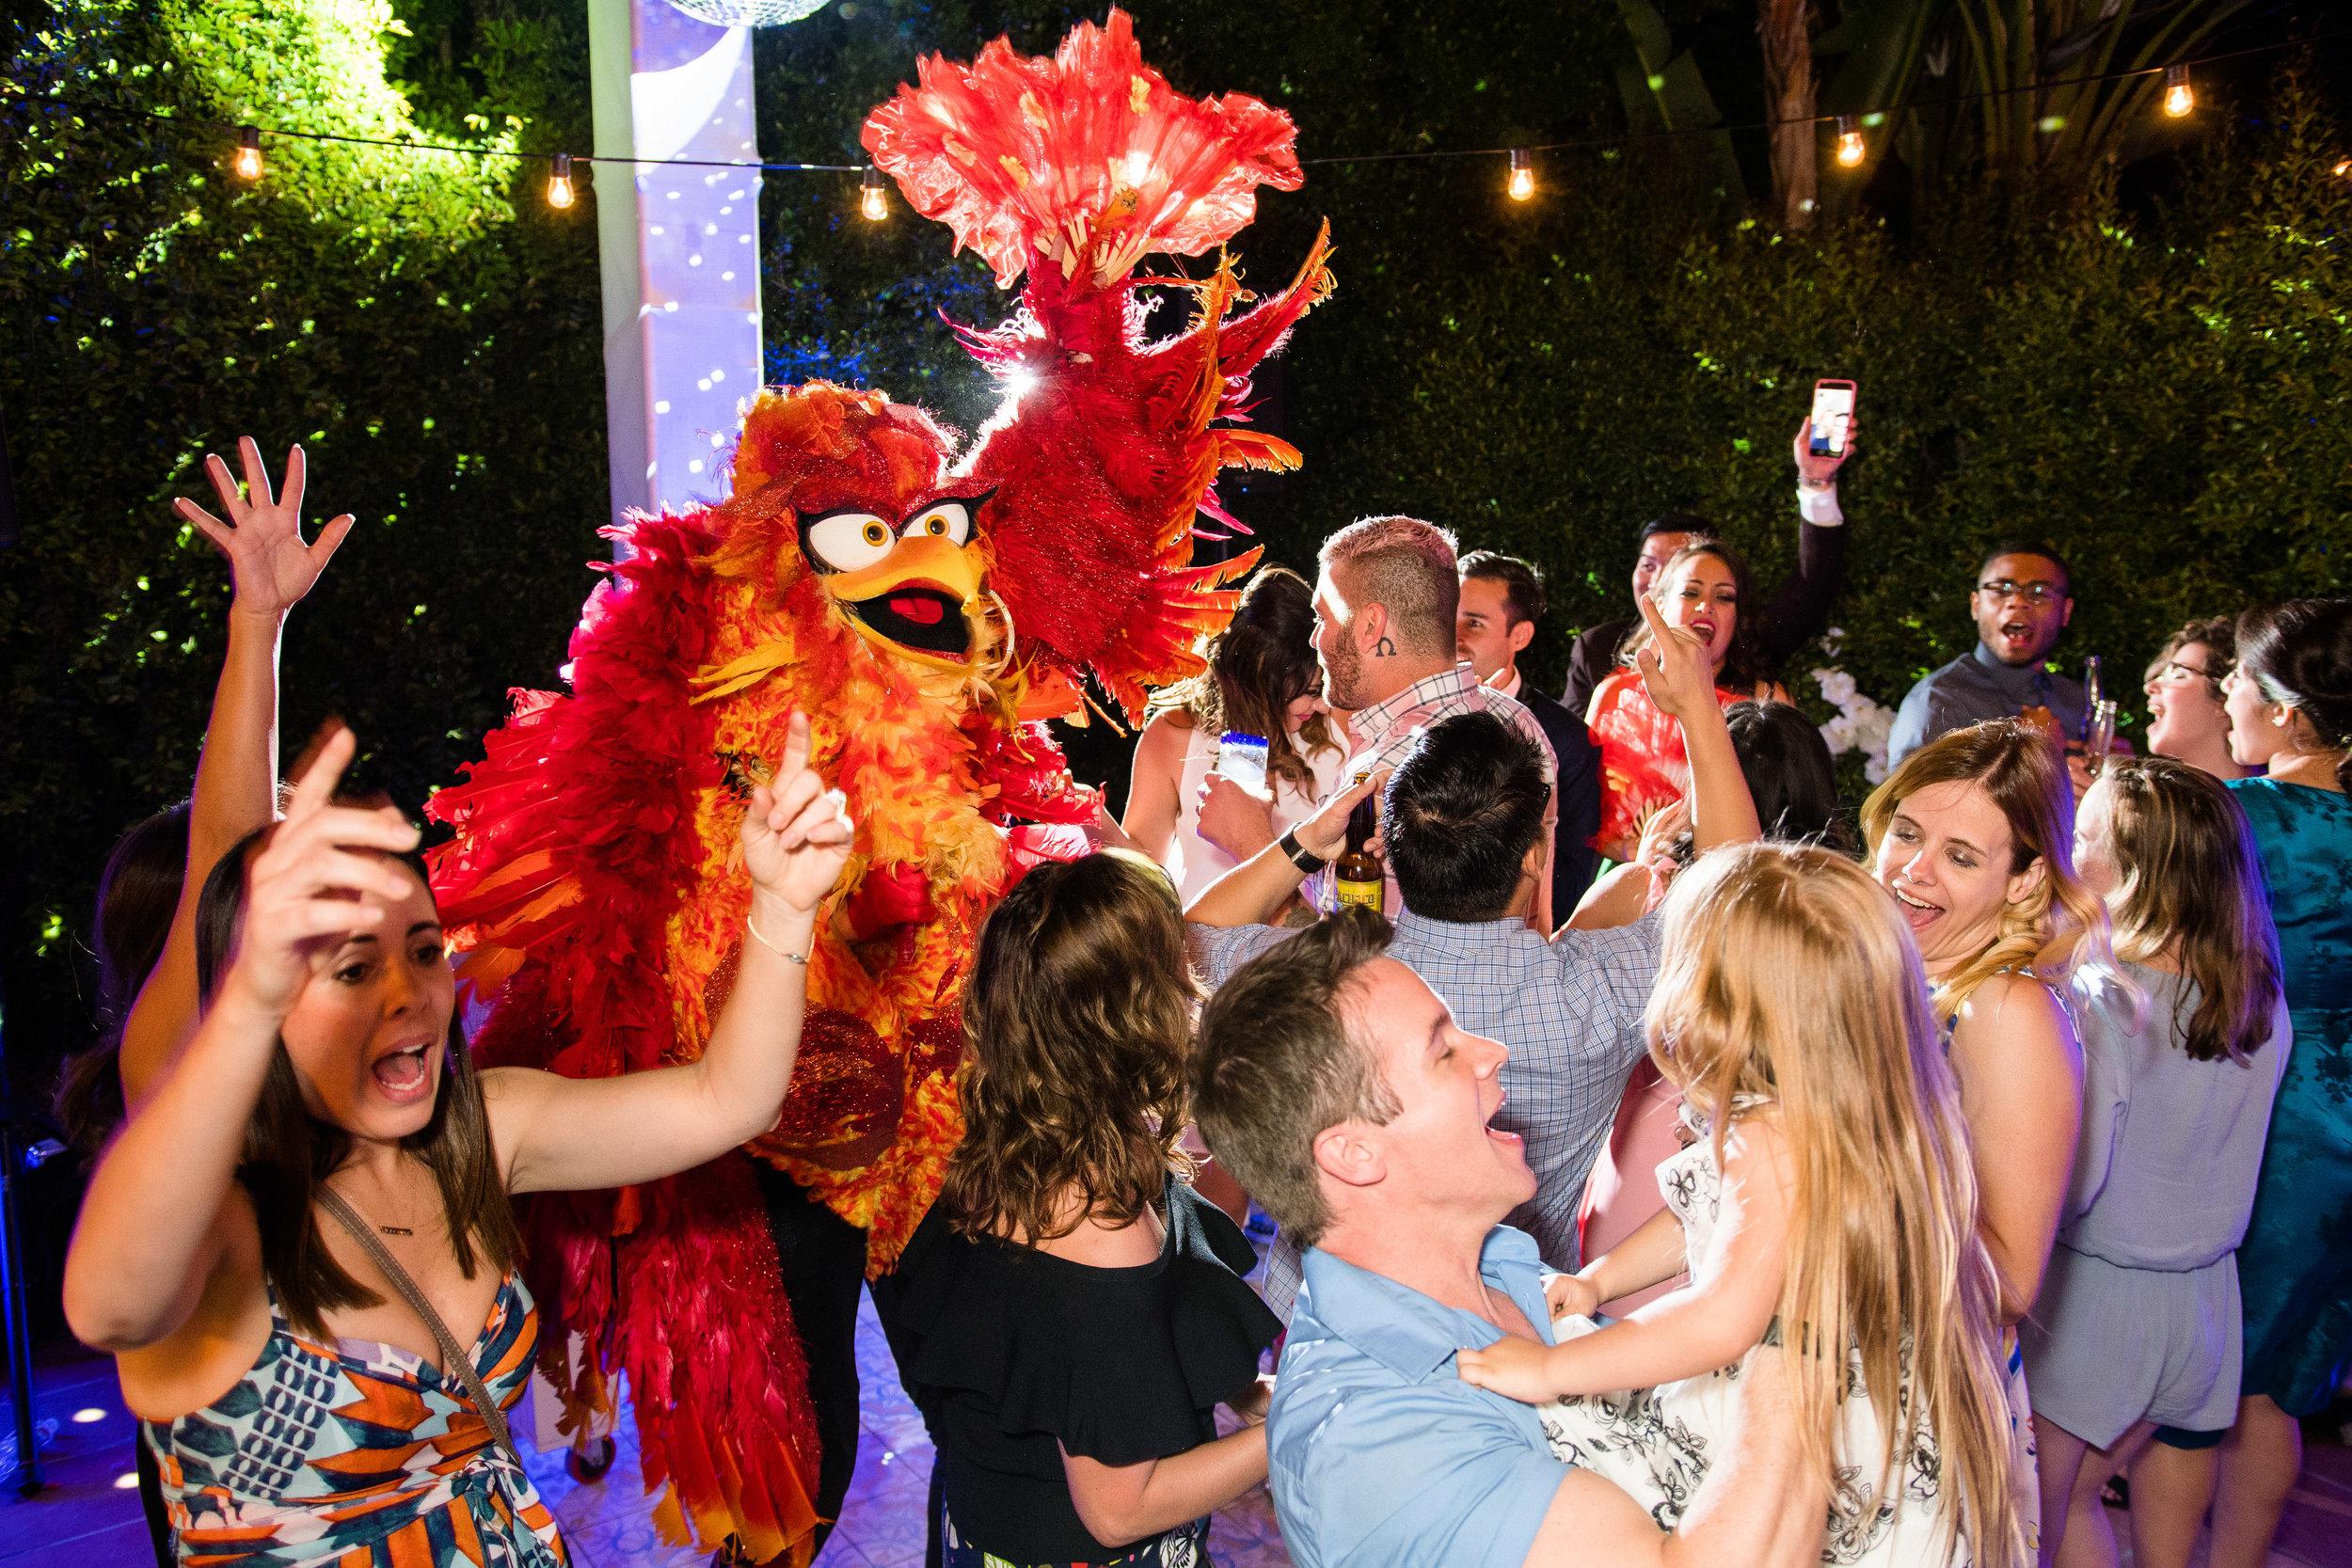 Vibrant Fiesta Backyard Wedding Reception miss fuego dancing with guests.jpg